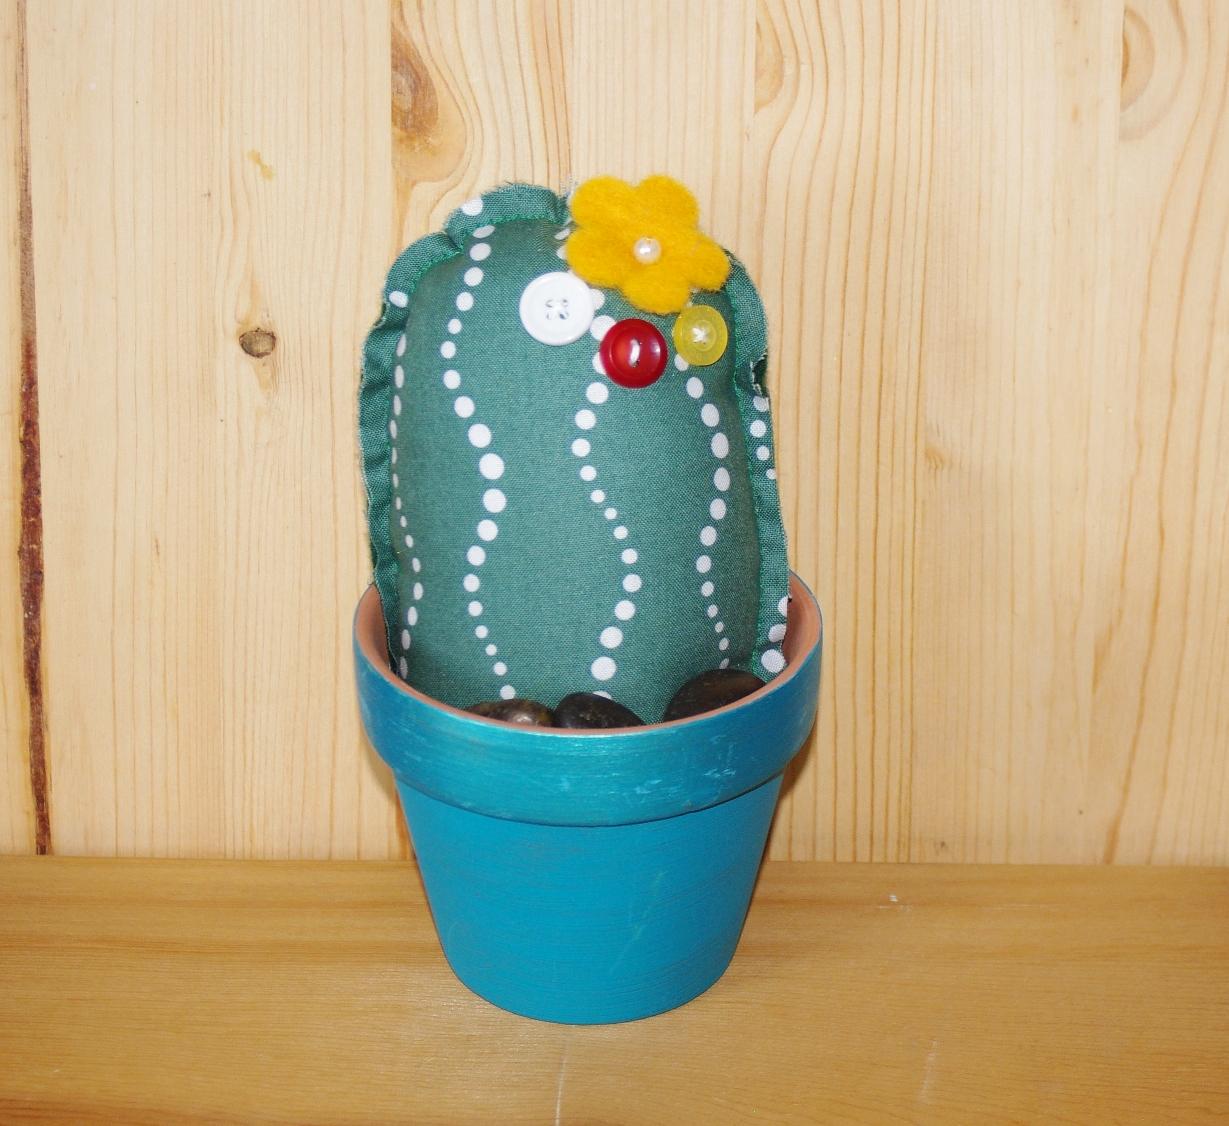 #P106 - Moyen Cactus $17